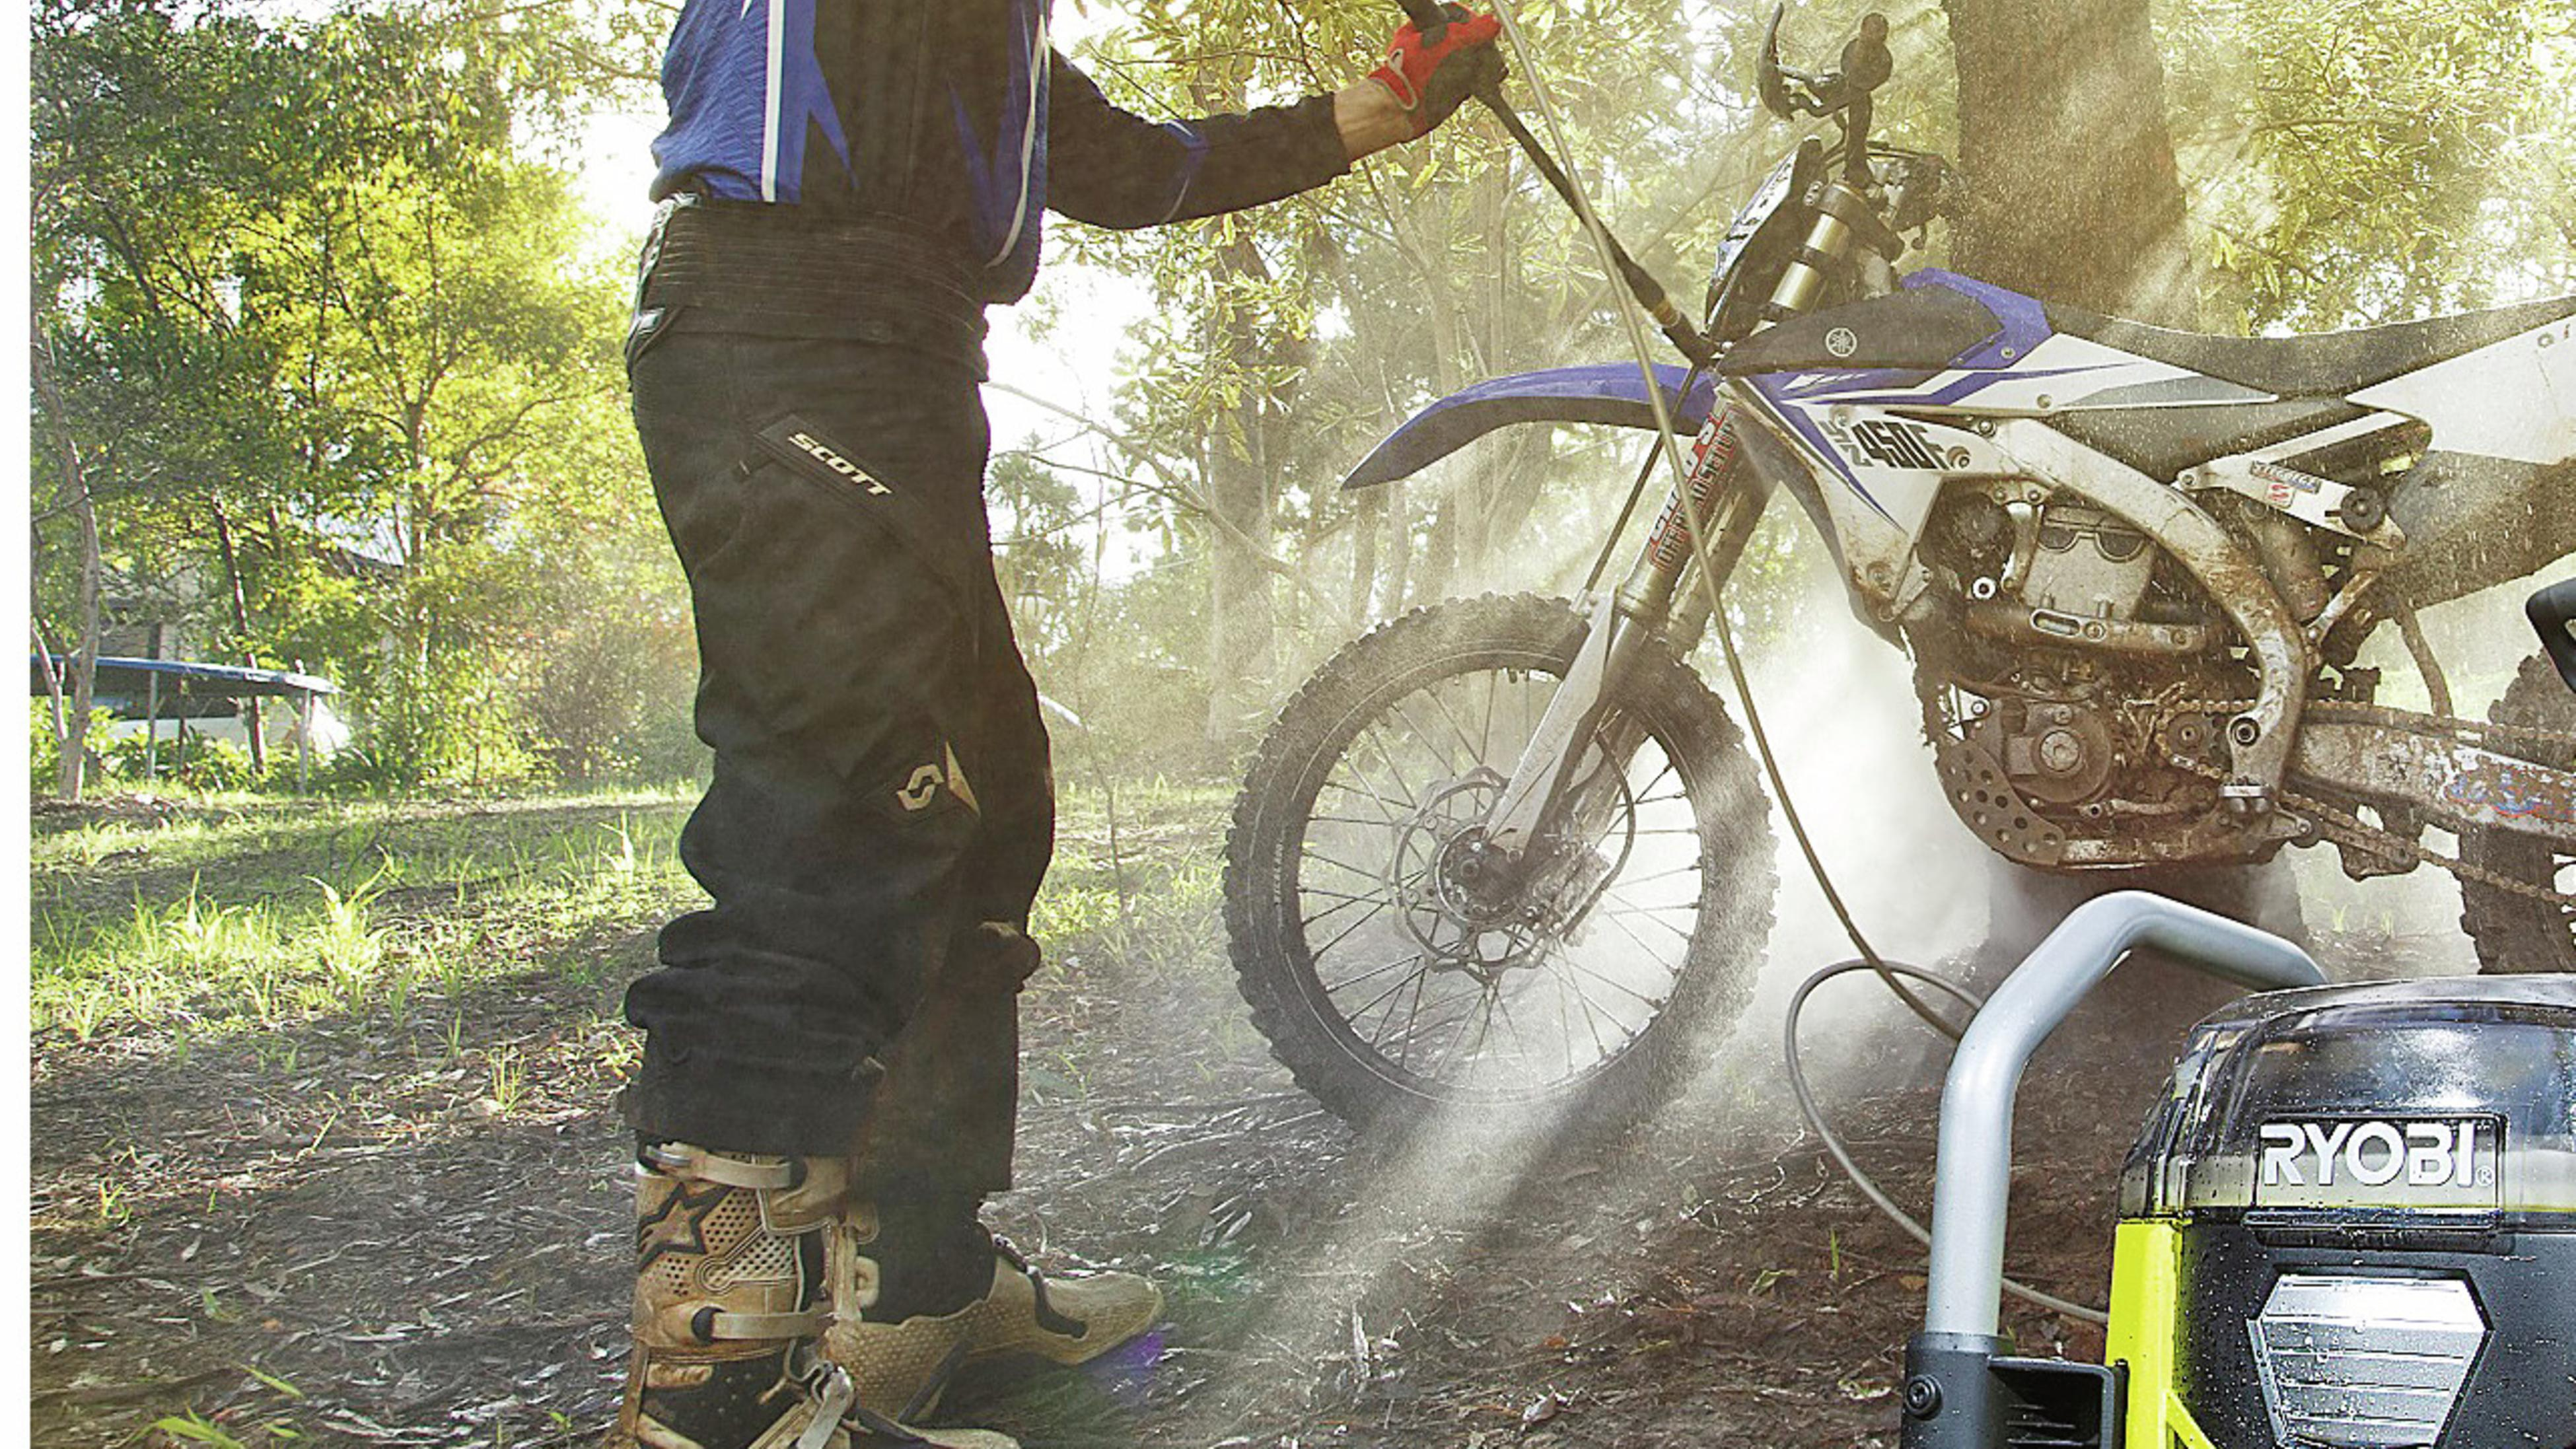 A pressure washer cleans a dirt bike.